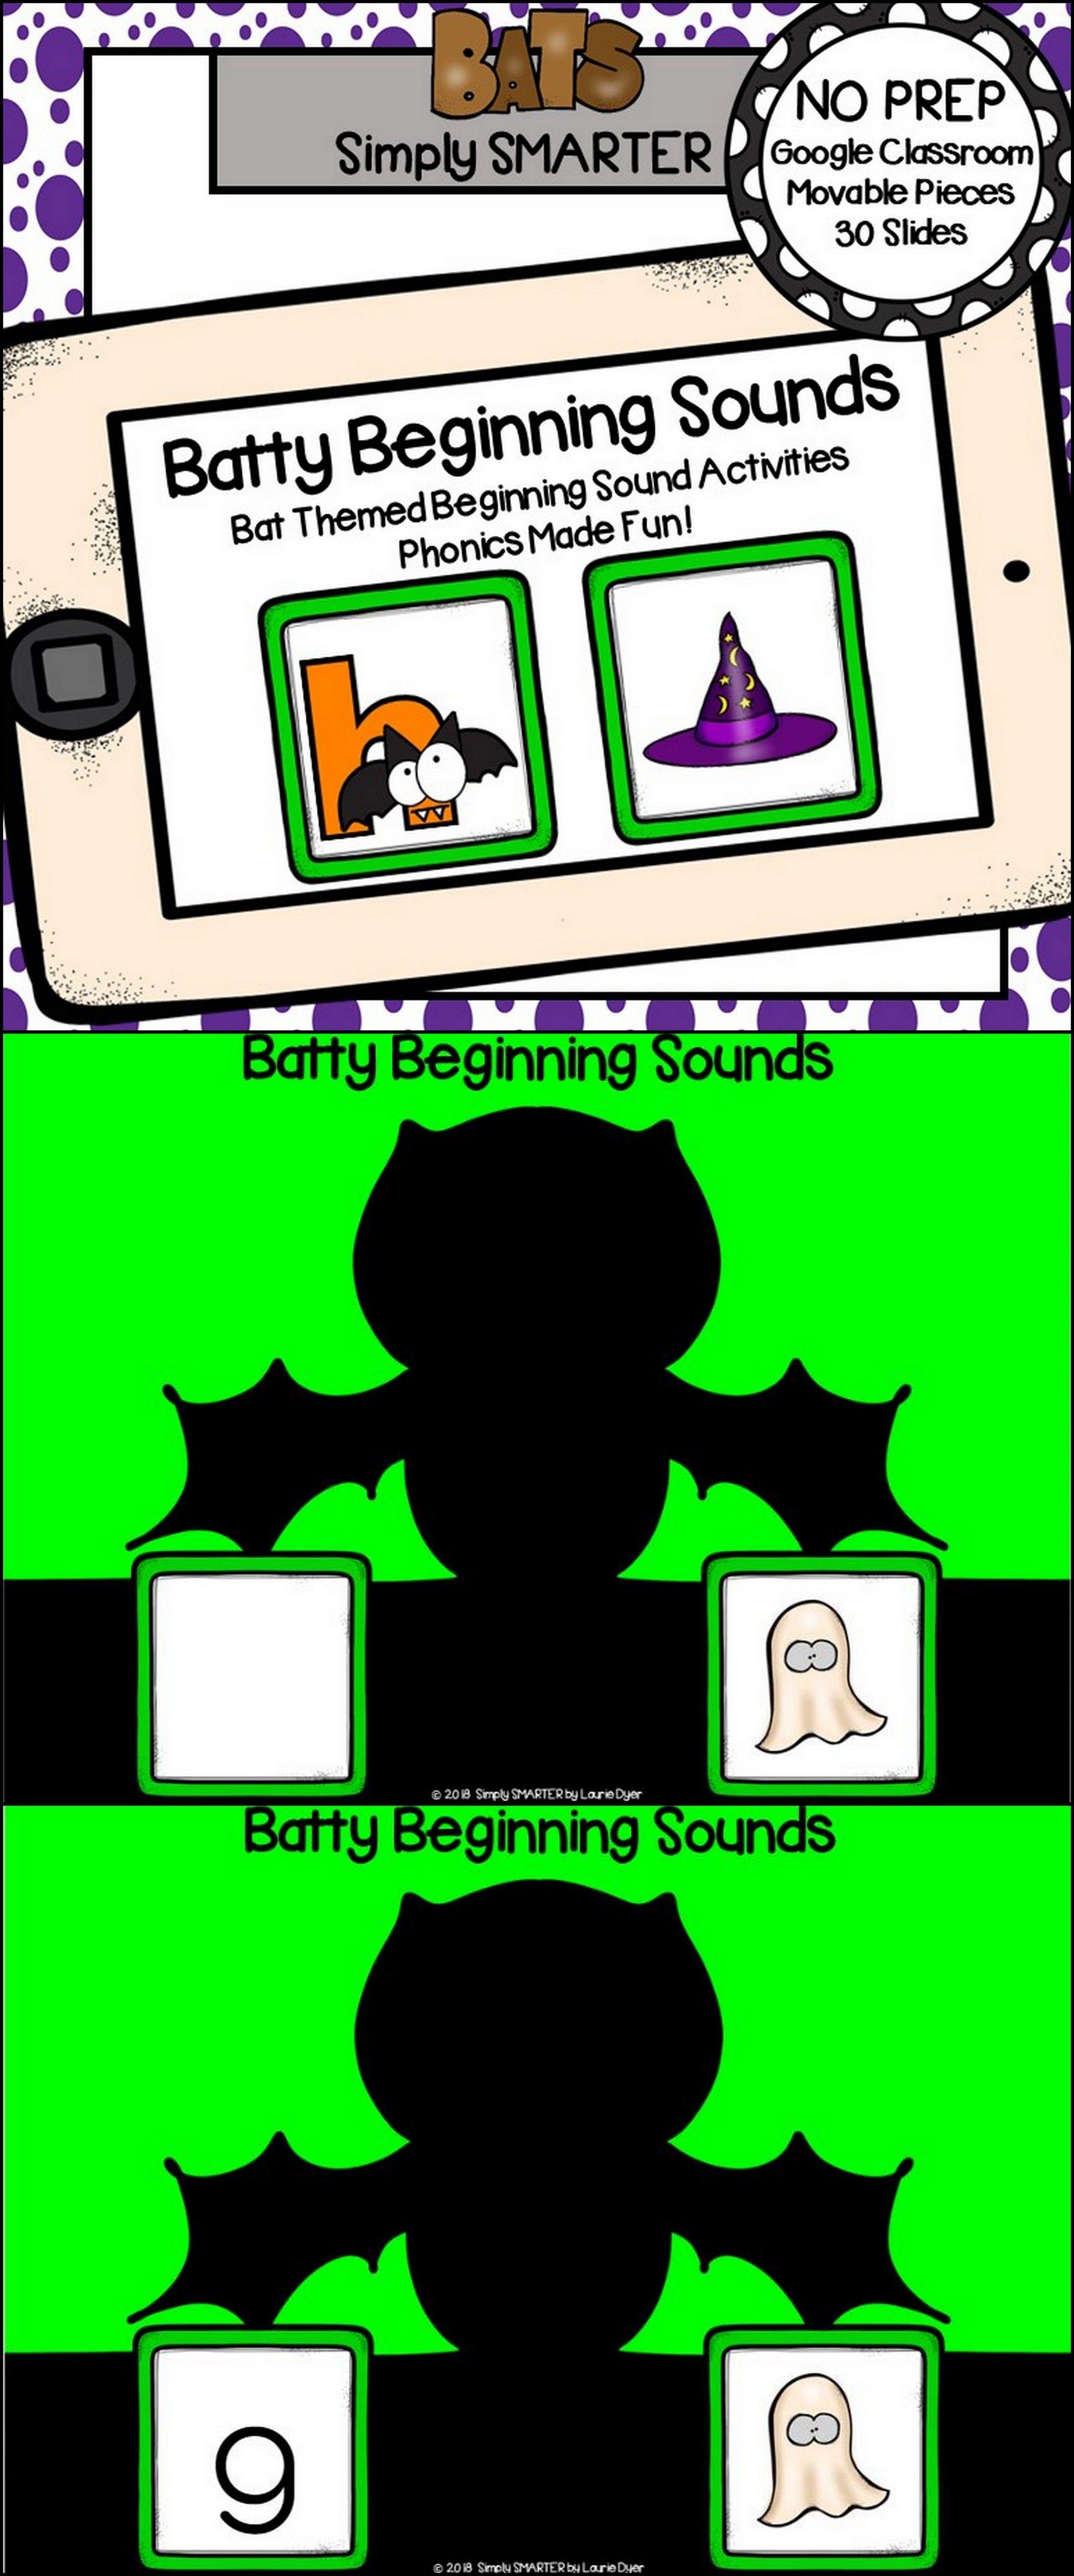 Bat Themed Beginning Sound Activities For Classroom